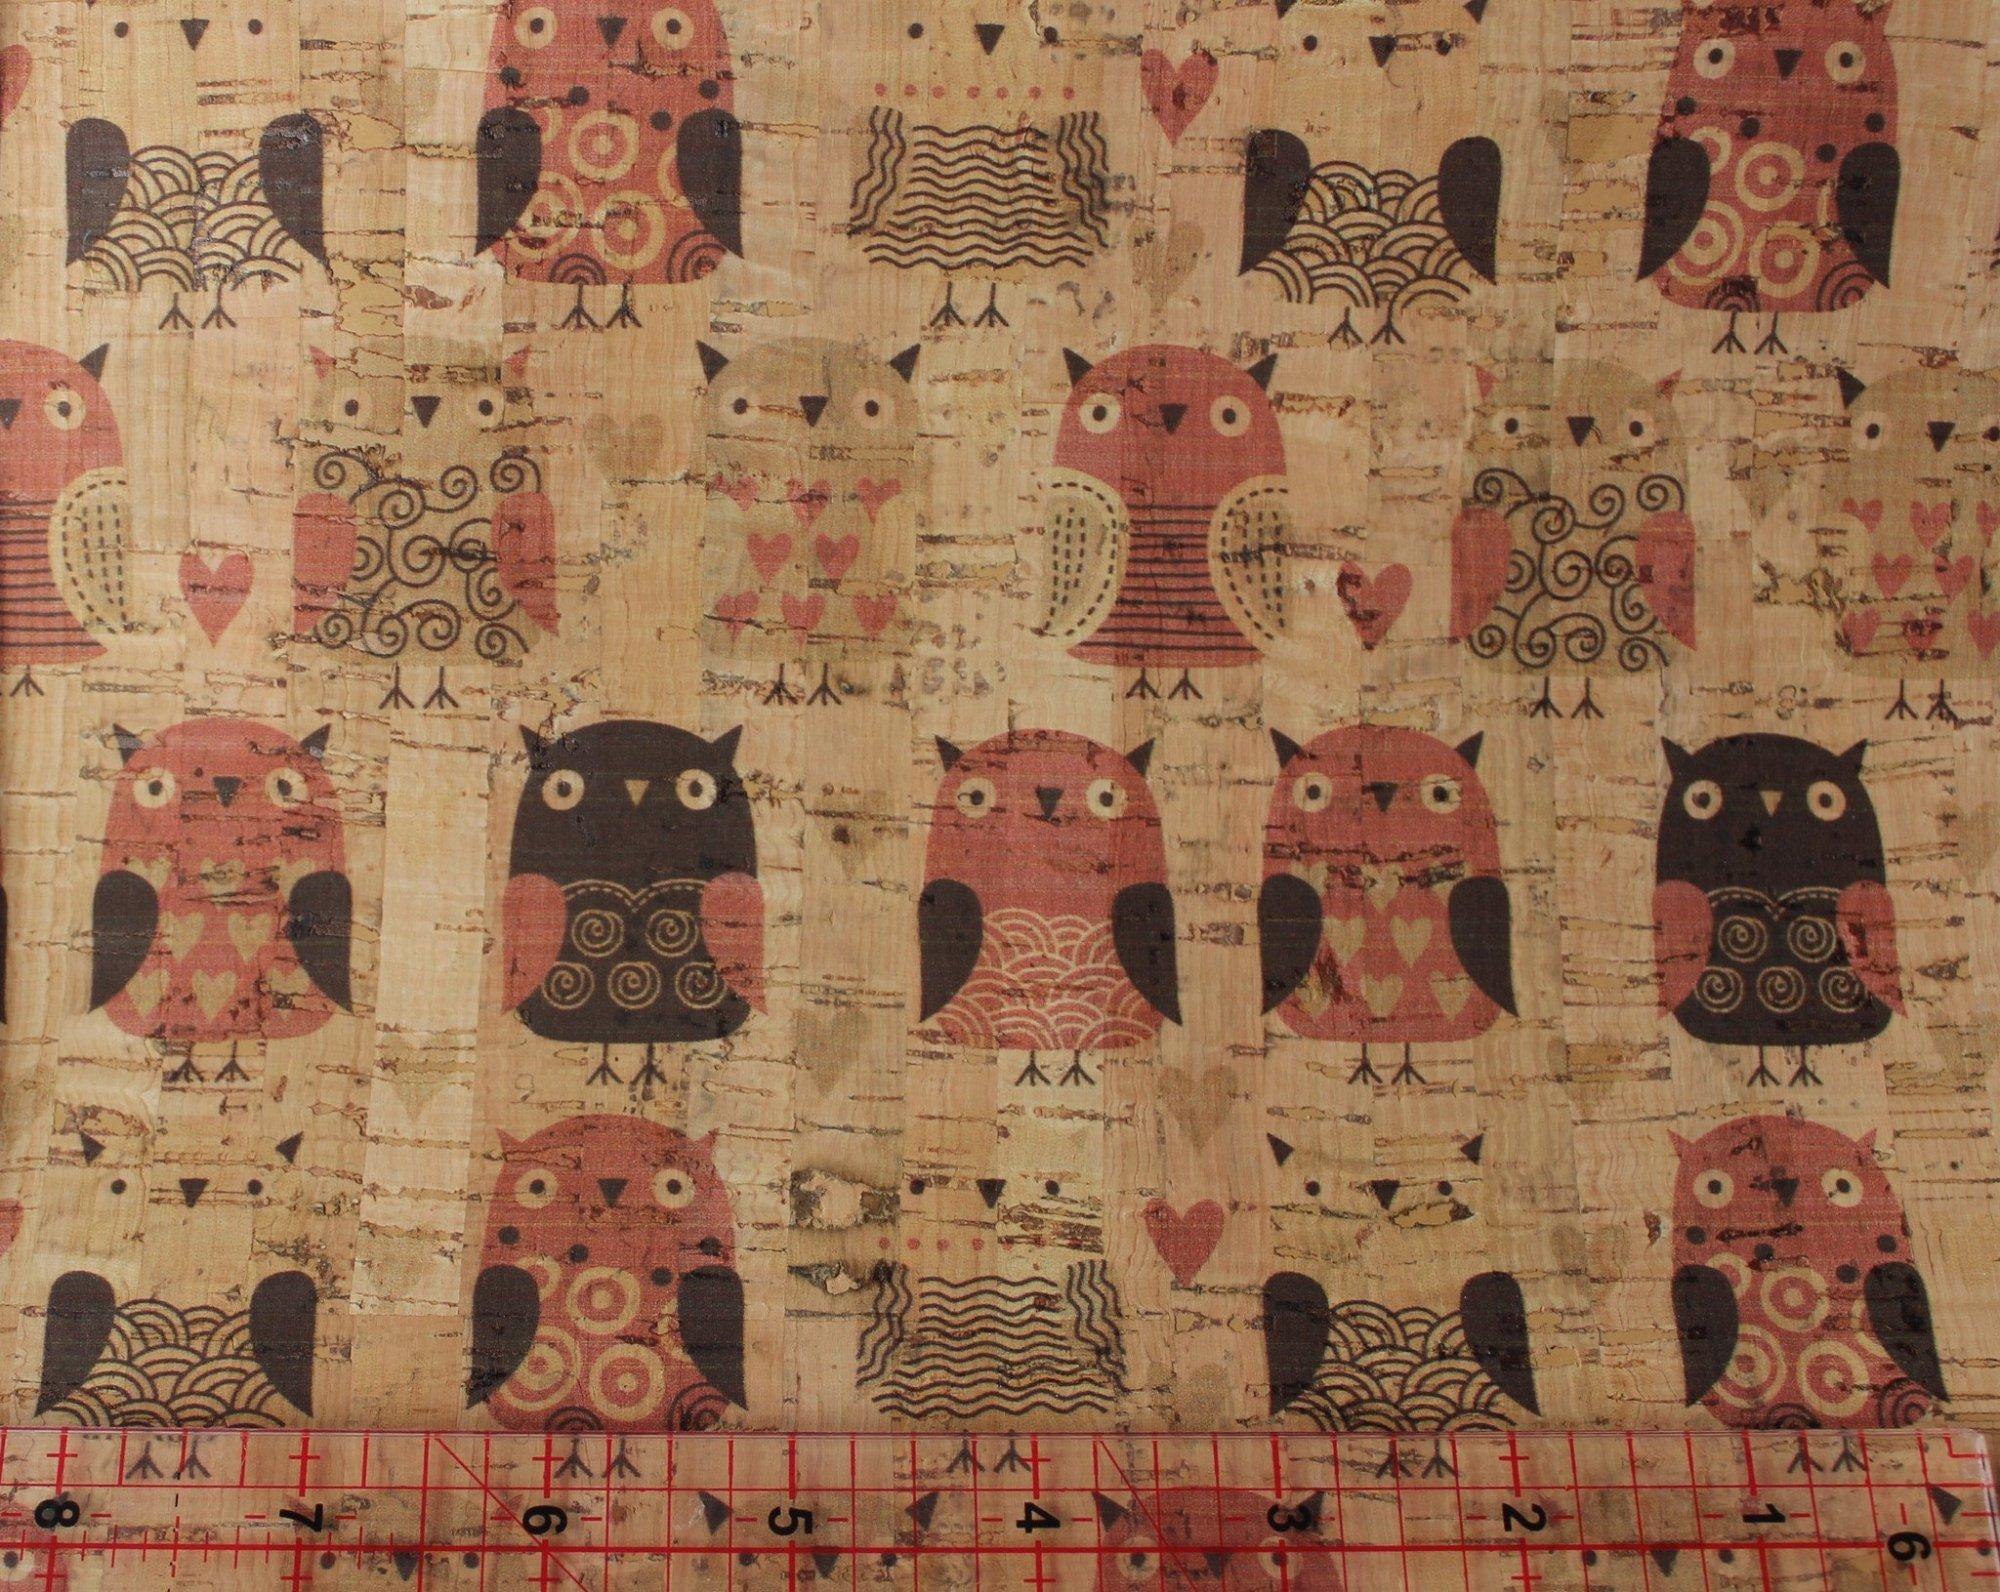 Printed Owls Cork Fabric (36x36)